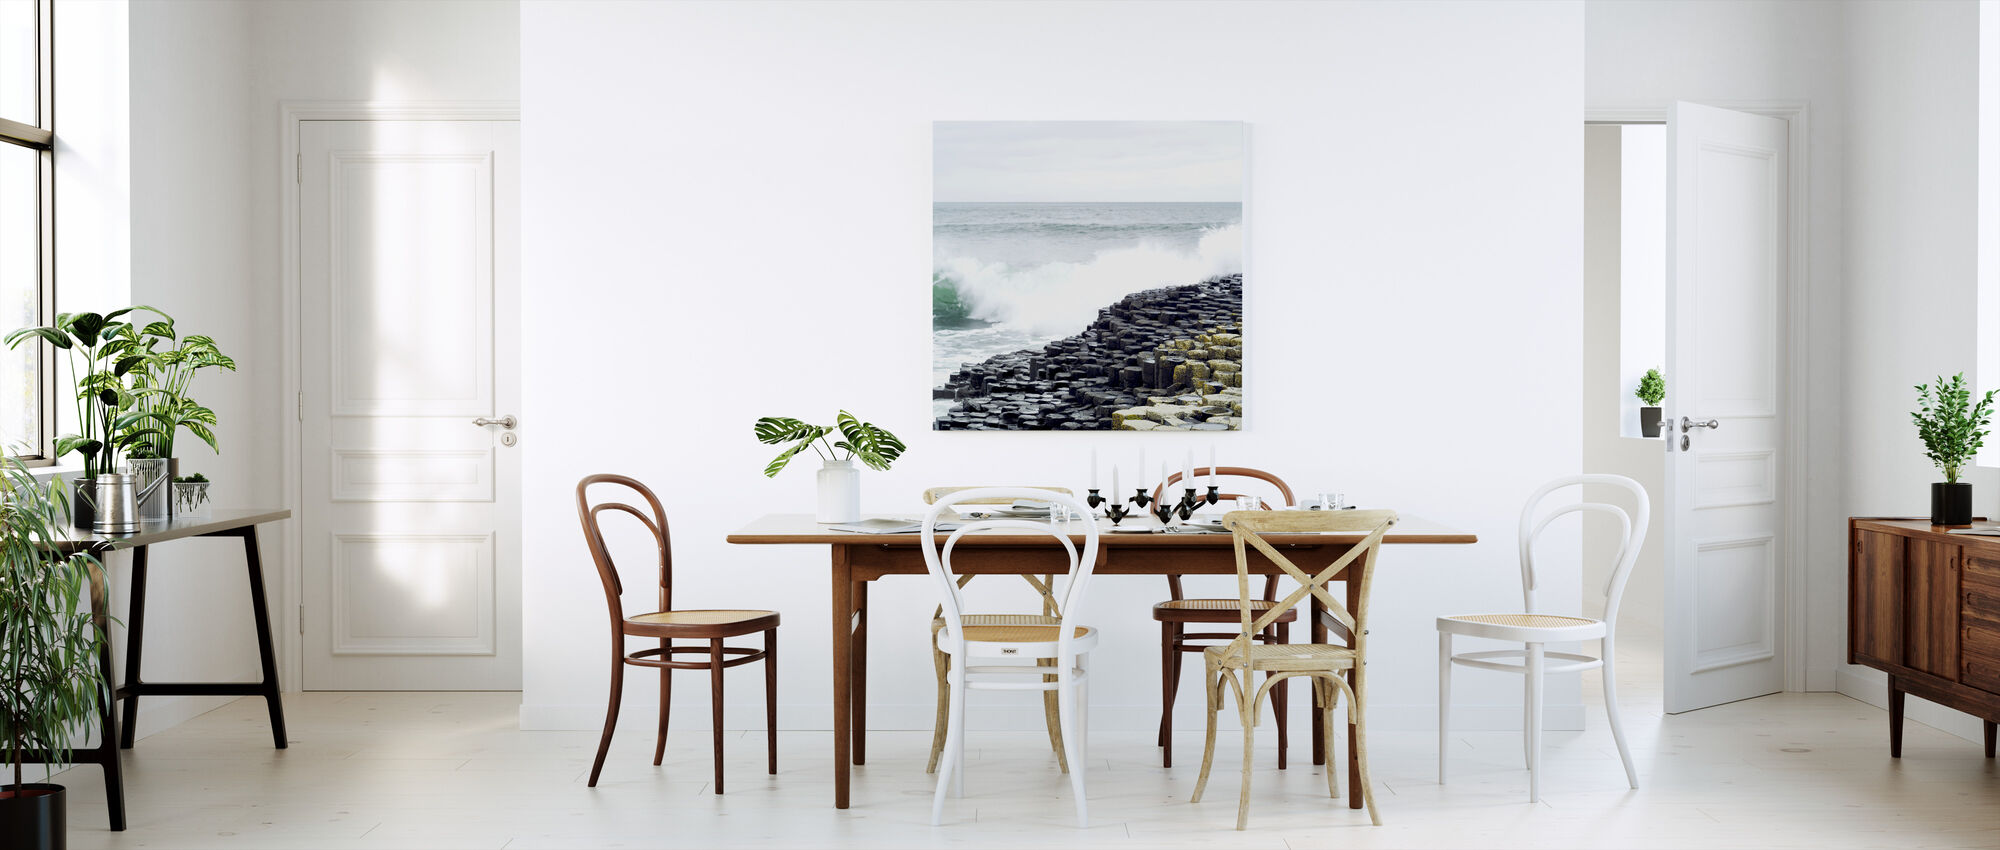 Waves Crashing in Giants Causeway - Canvas print - Kitchen